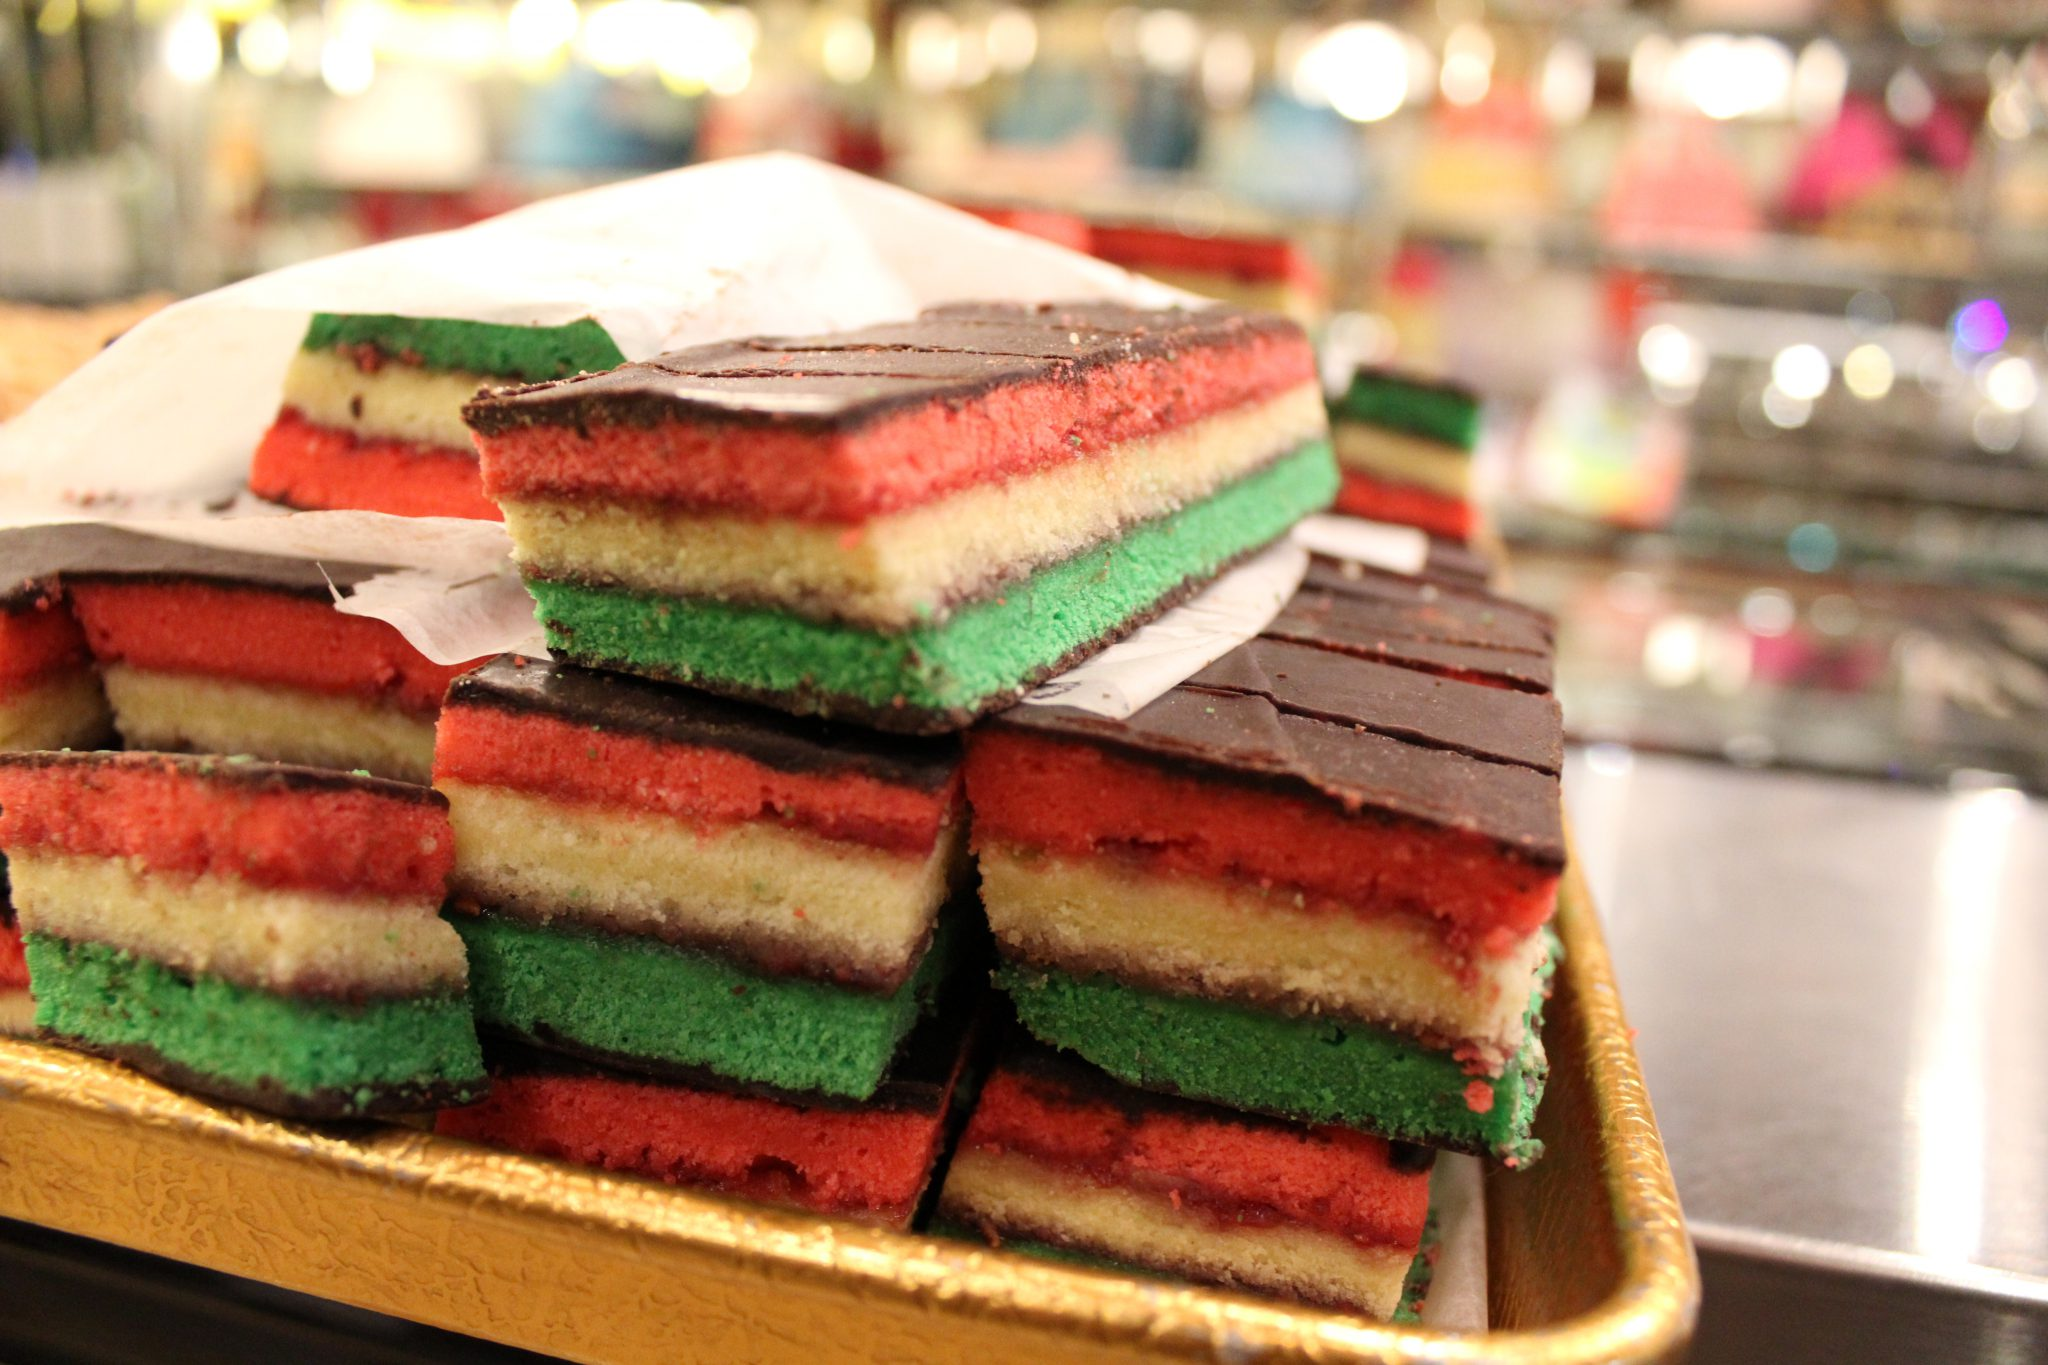 Average  Layer Cake Weight